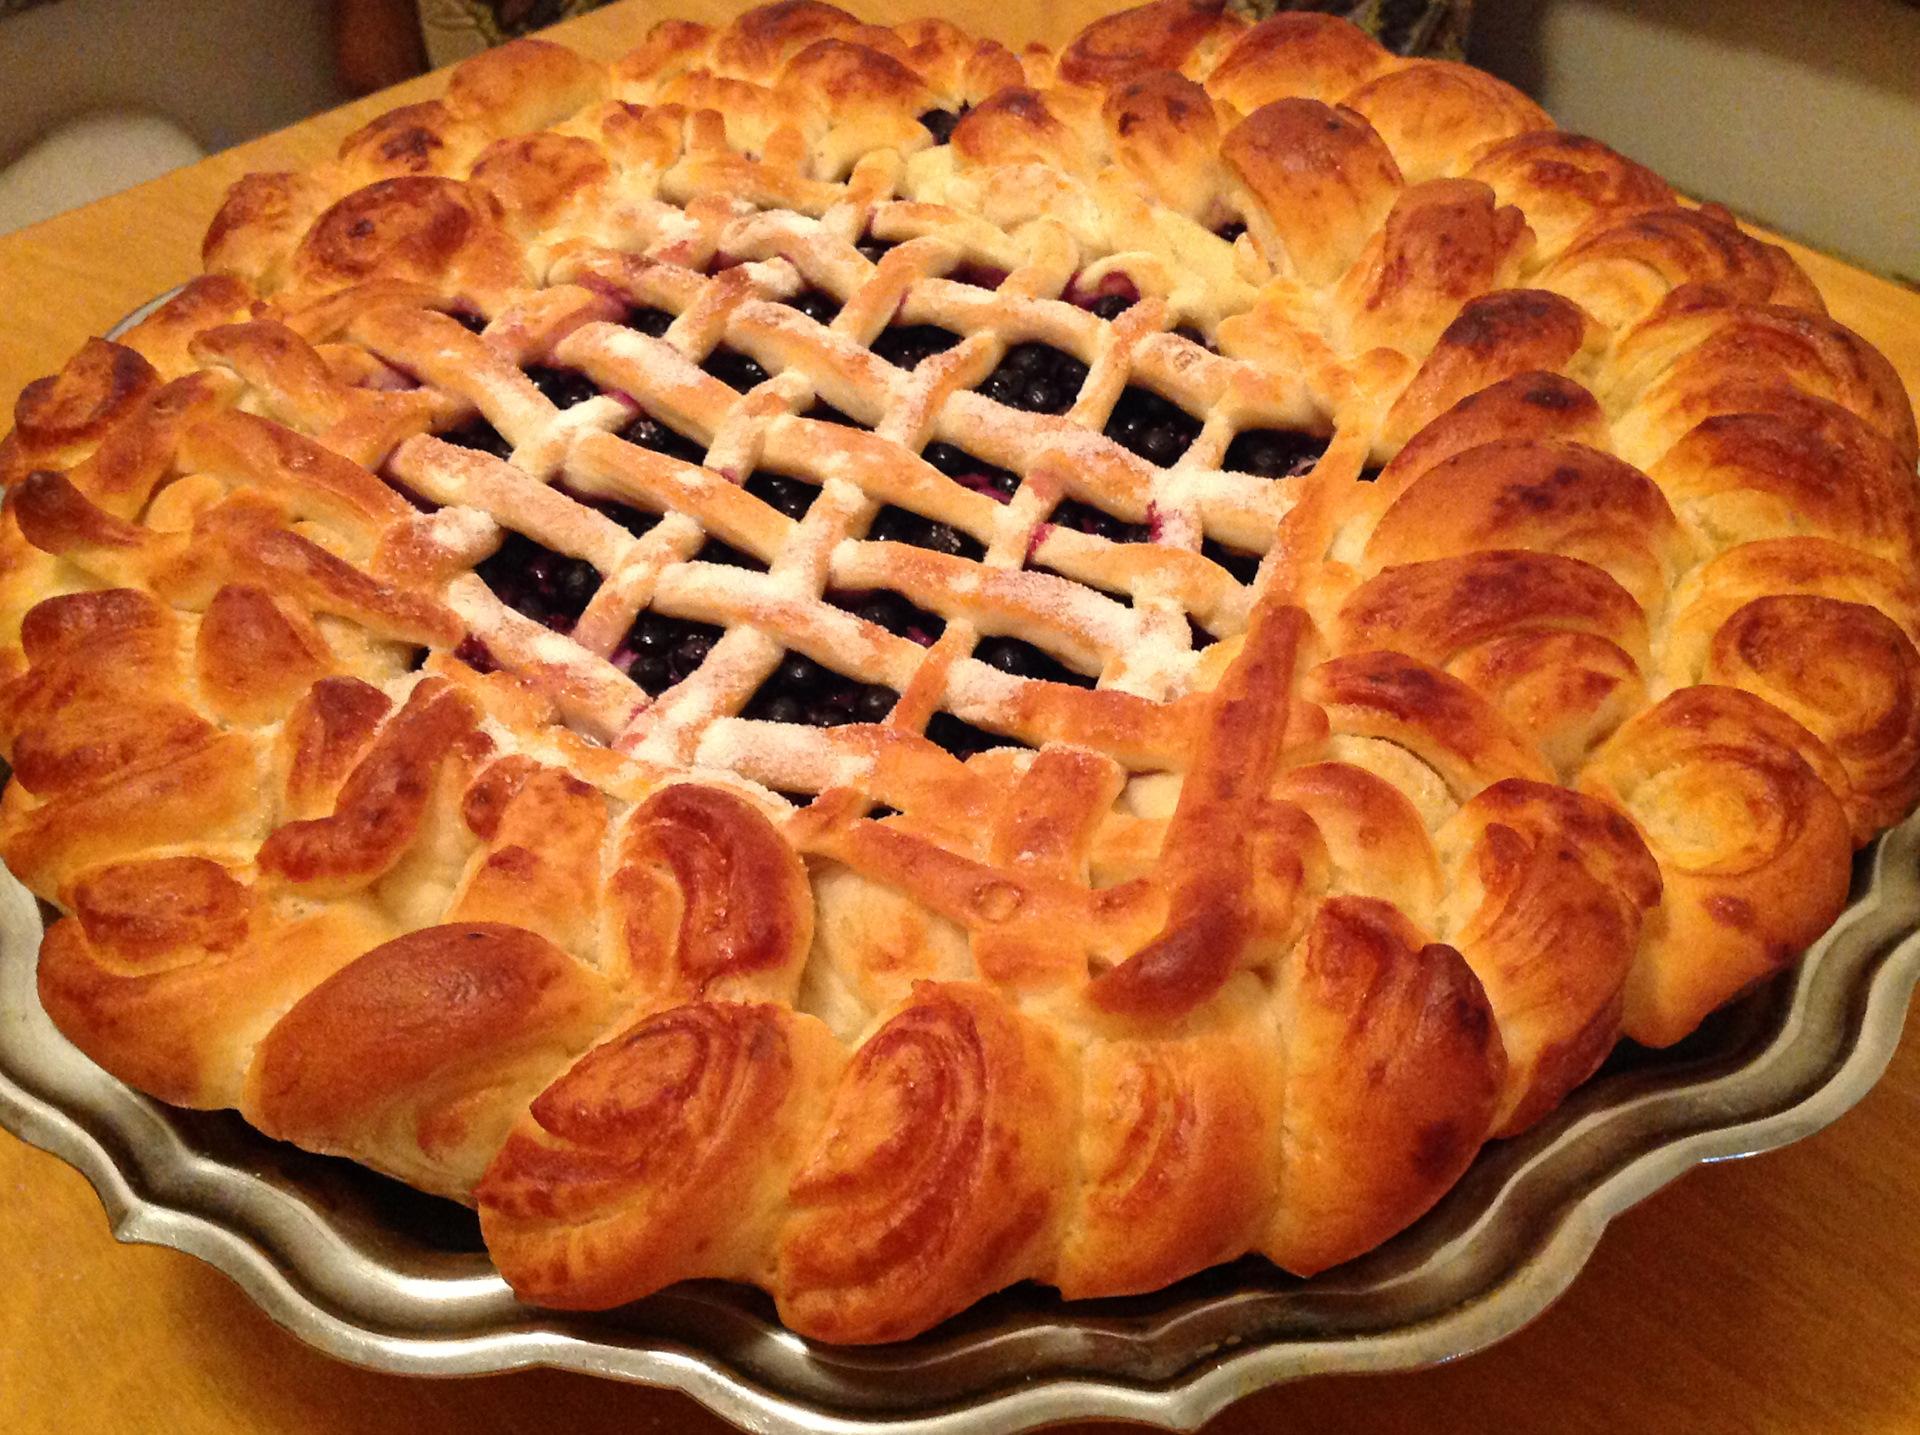 пироги из дрожжевого теста рецепты с фото всех